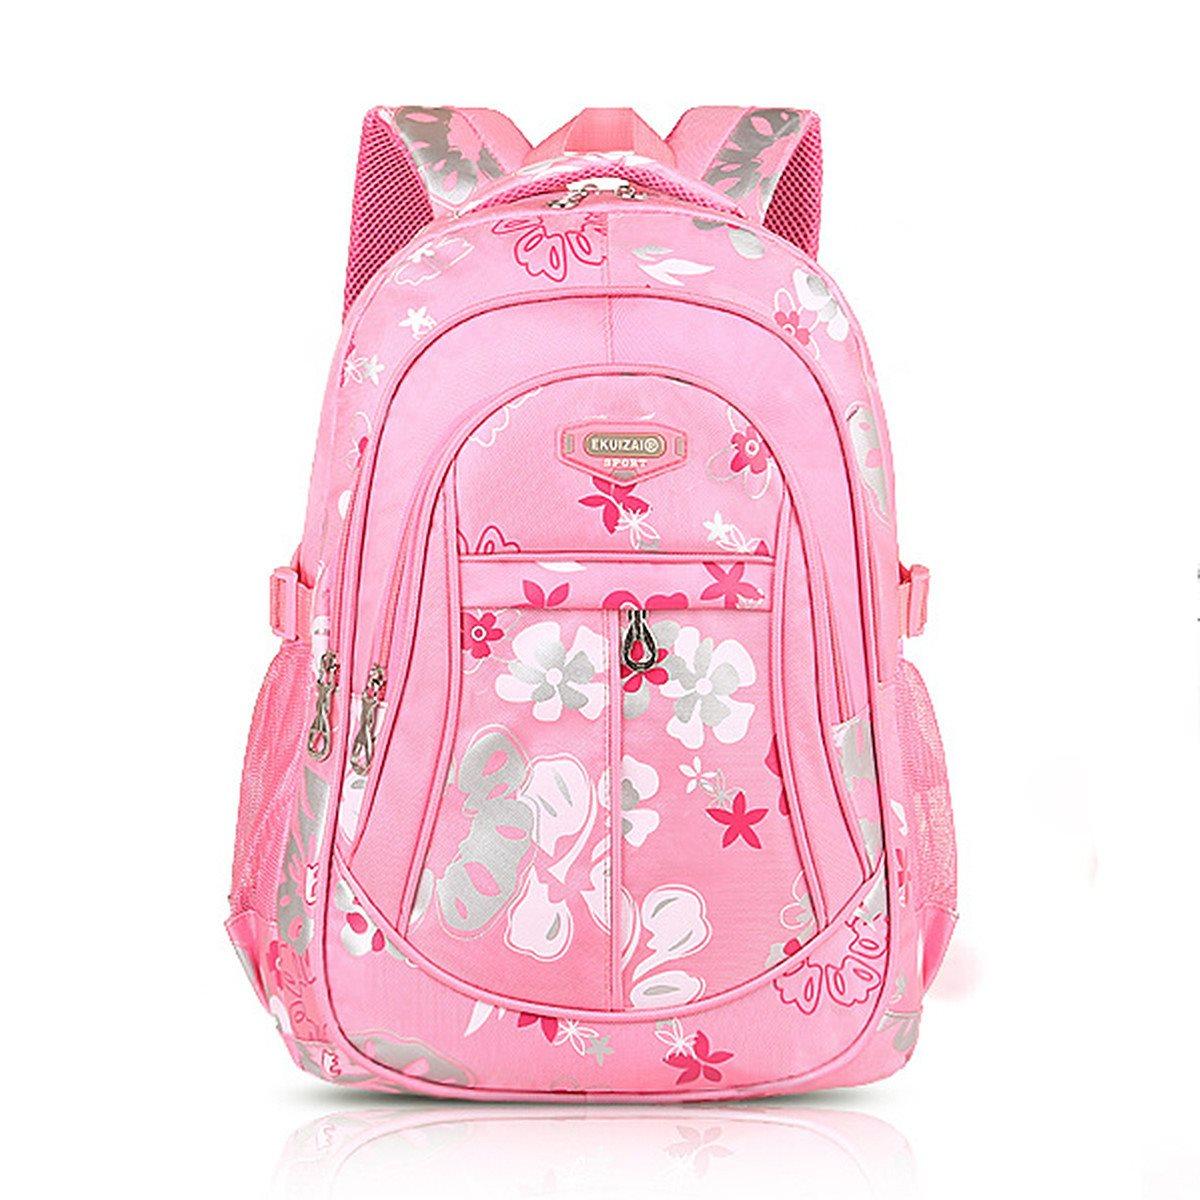 Aliexpress.com : Buy 2016 Children Canvas Backpack Girls Mochila ...